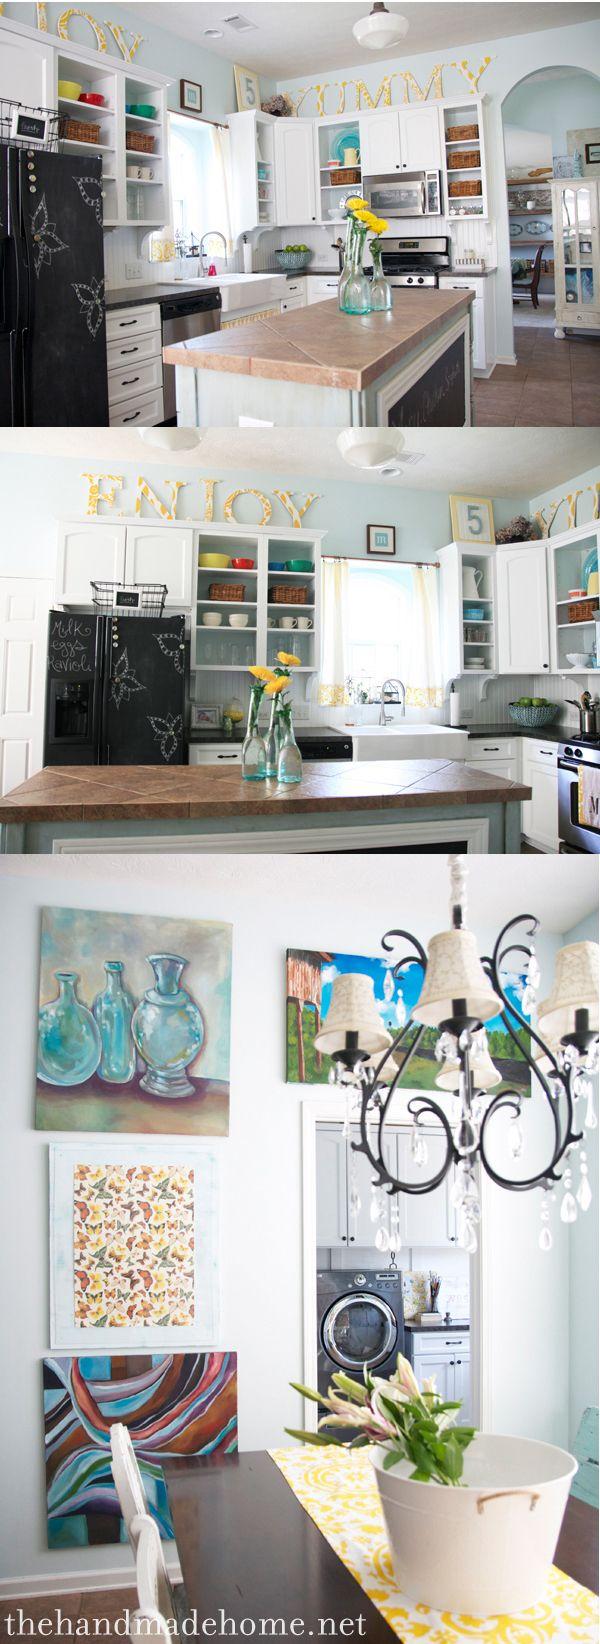 35 best top of kitchen cabinet decor images on pinterest kitchen